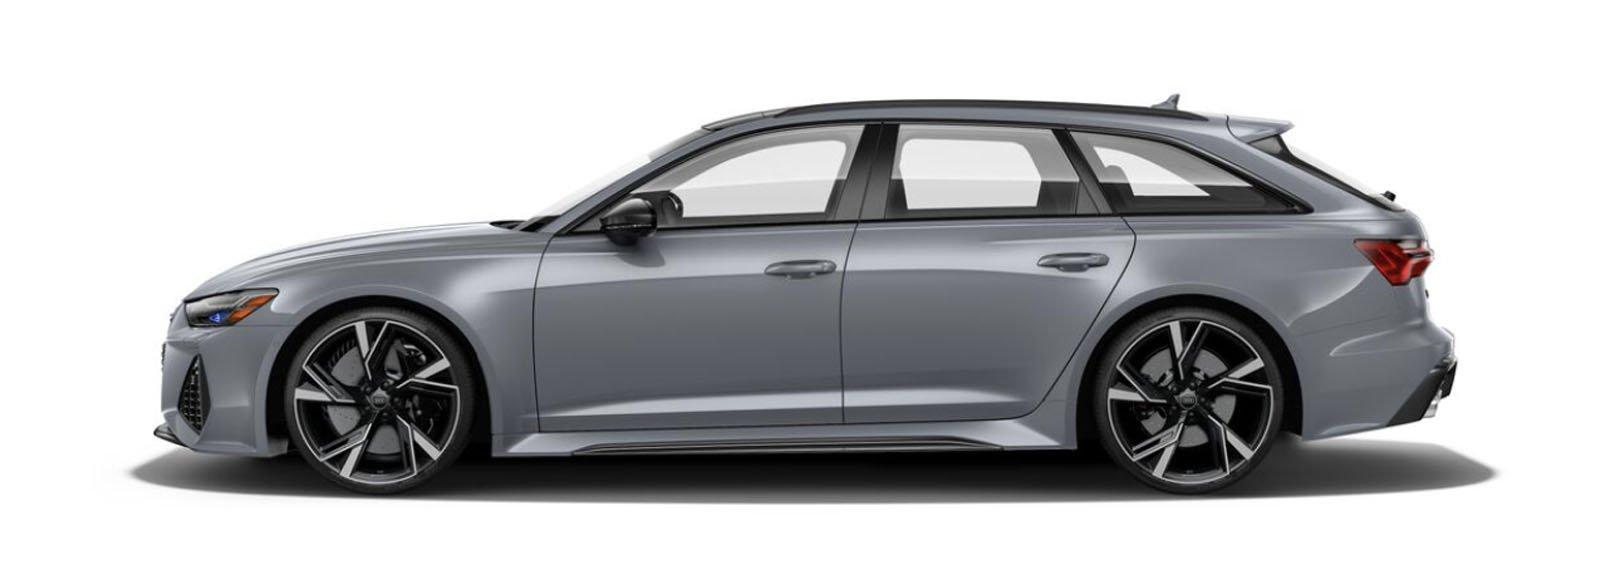 2021 Audi RS 6 Avant Nardo Gray